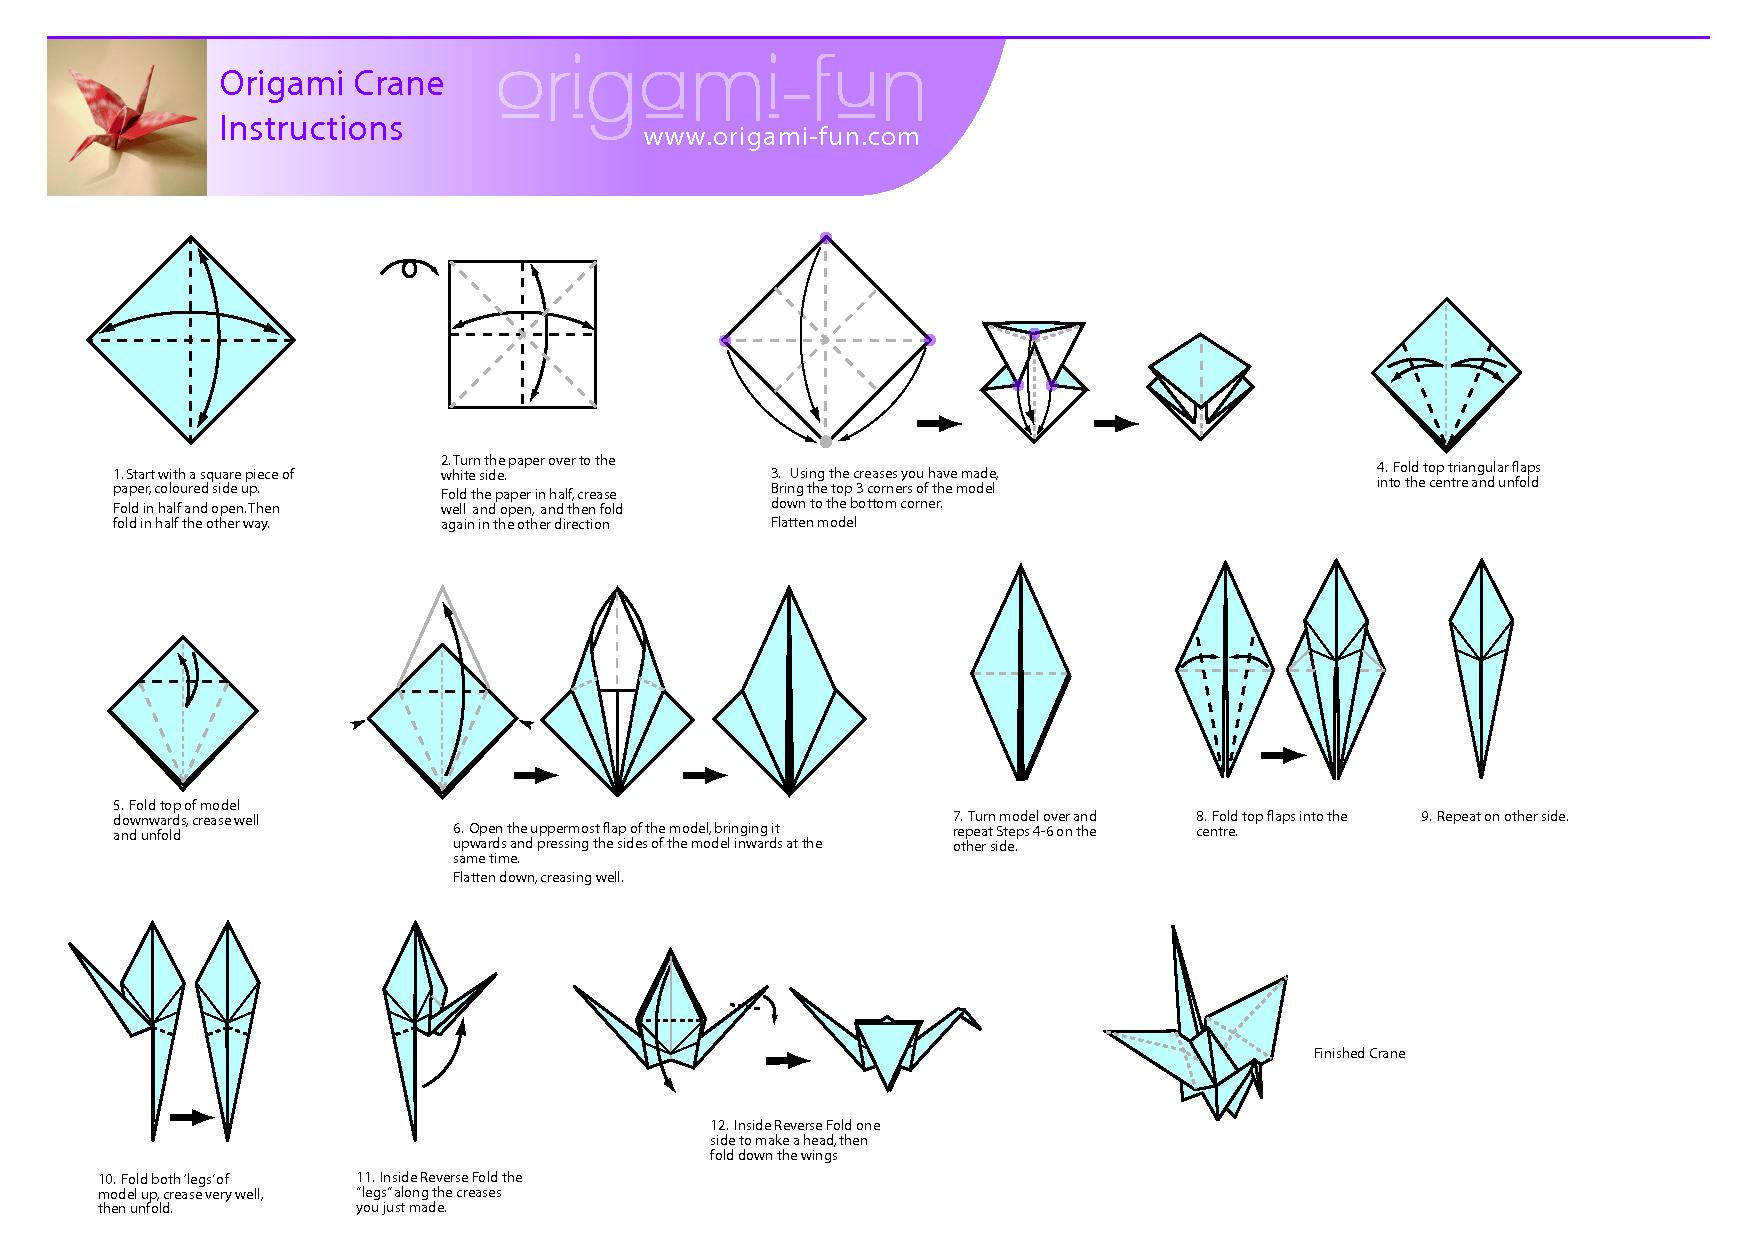 Origami Swan Diagram Just Another Wiring Blog Goose Diagrams Paper Crane Scematic Rh 68 Jessicadonath De 3d